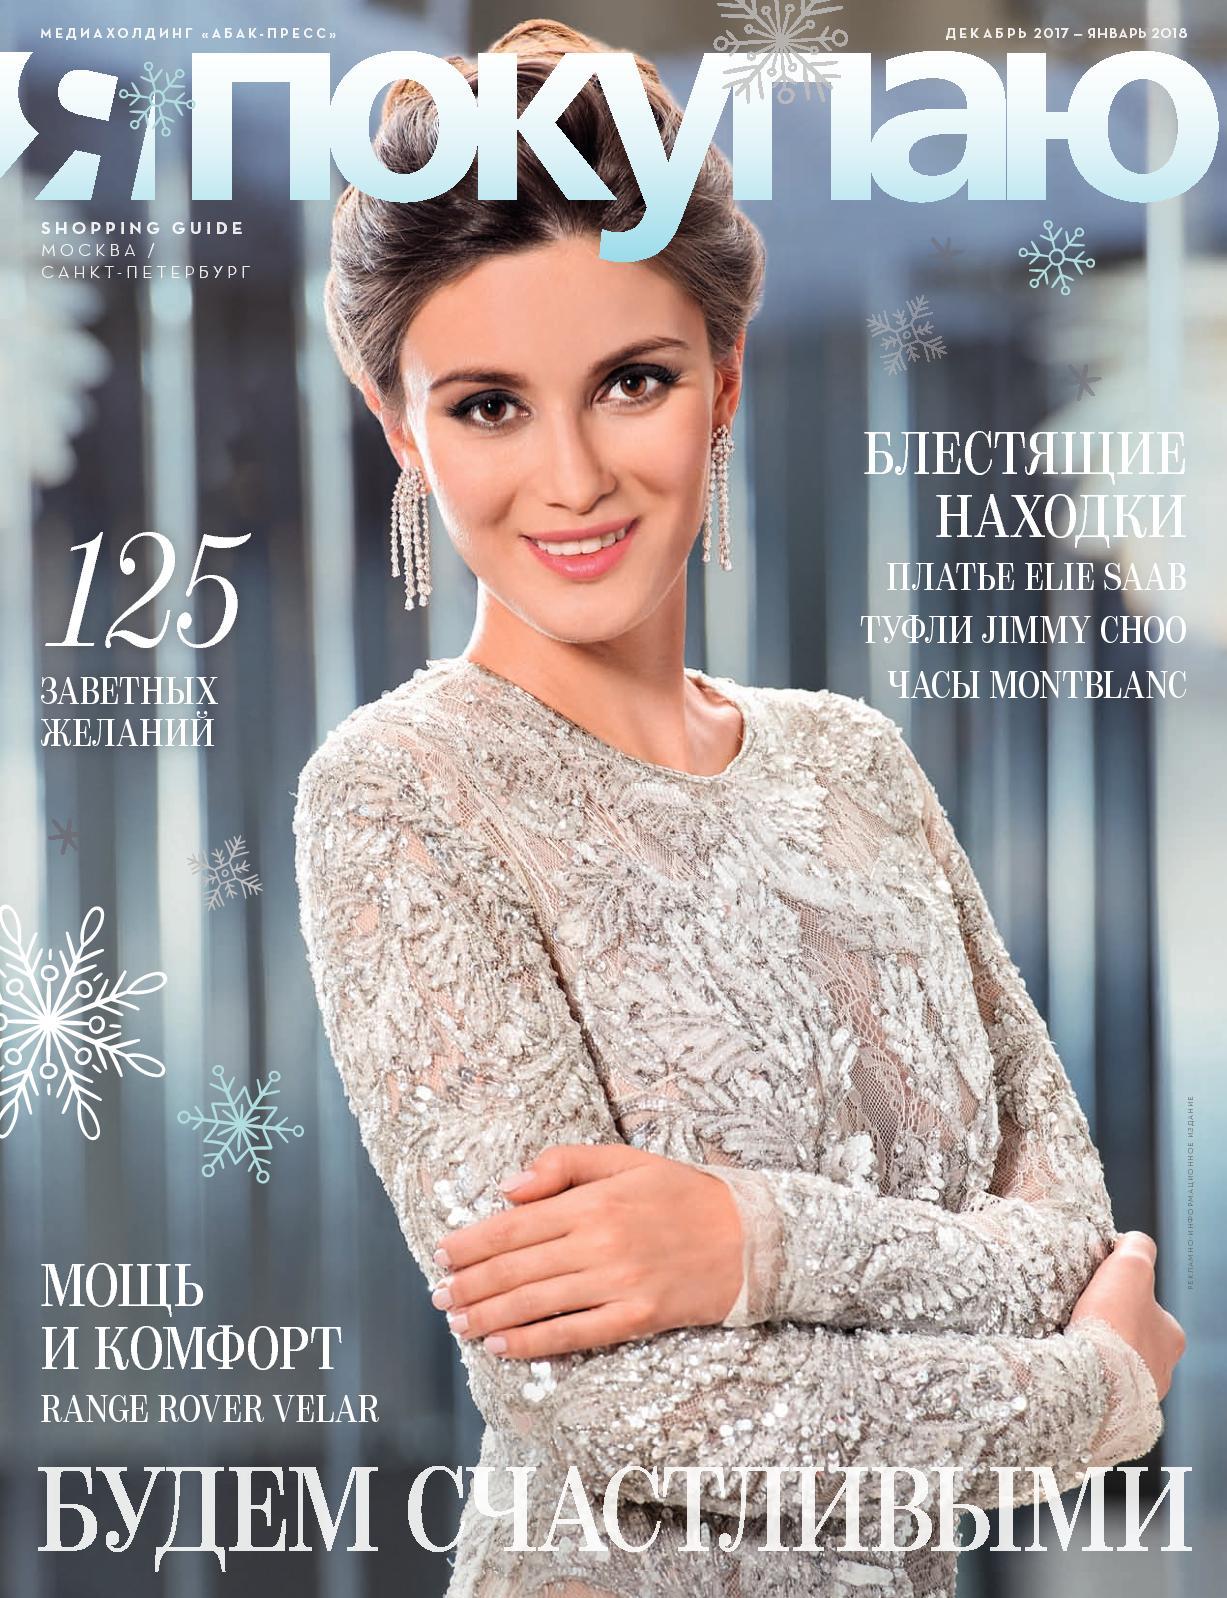 Calaméo - Shopping Guide «Я Покупаю. Москва - Санкт-Петербург», декабрь  2017 - январь 2018 1f7a6536950